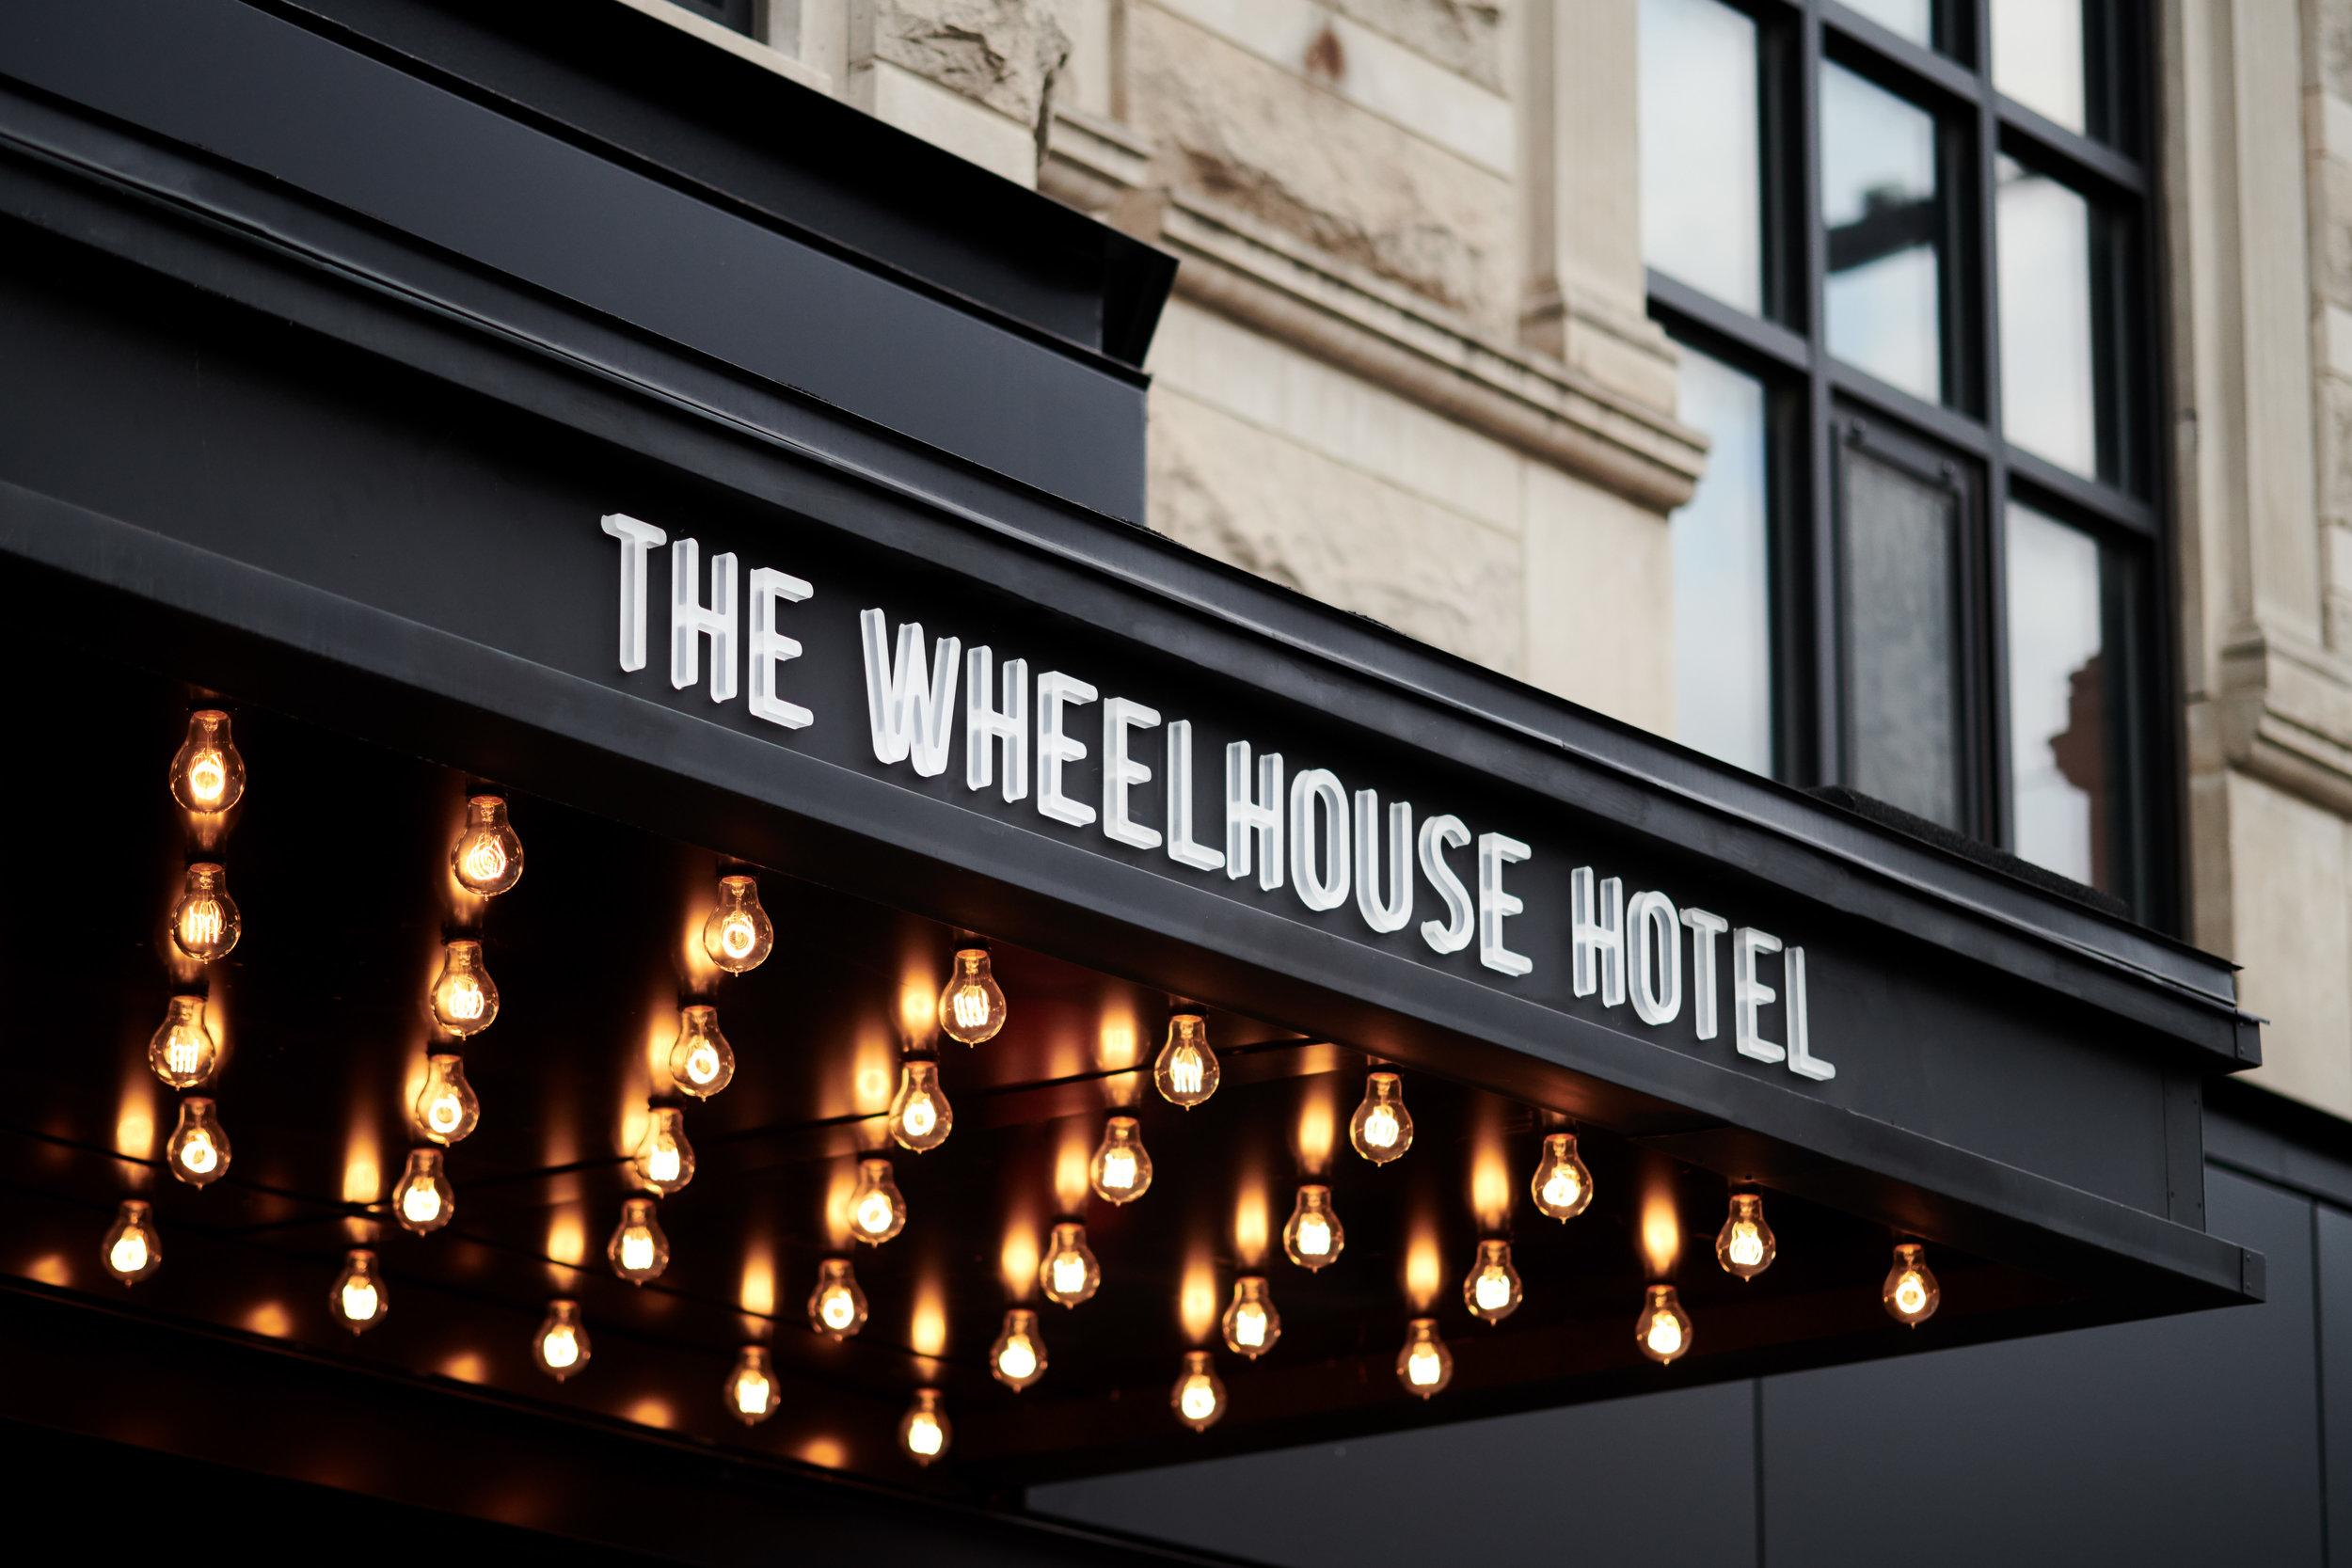 Wheelhouse_Curioso_chicago_Kelleghan.jpg